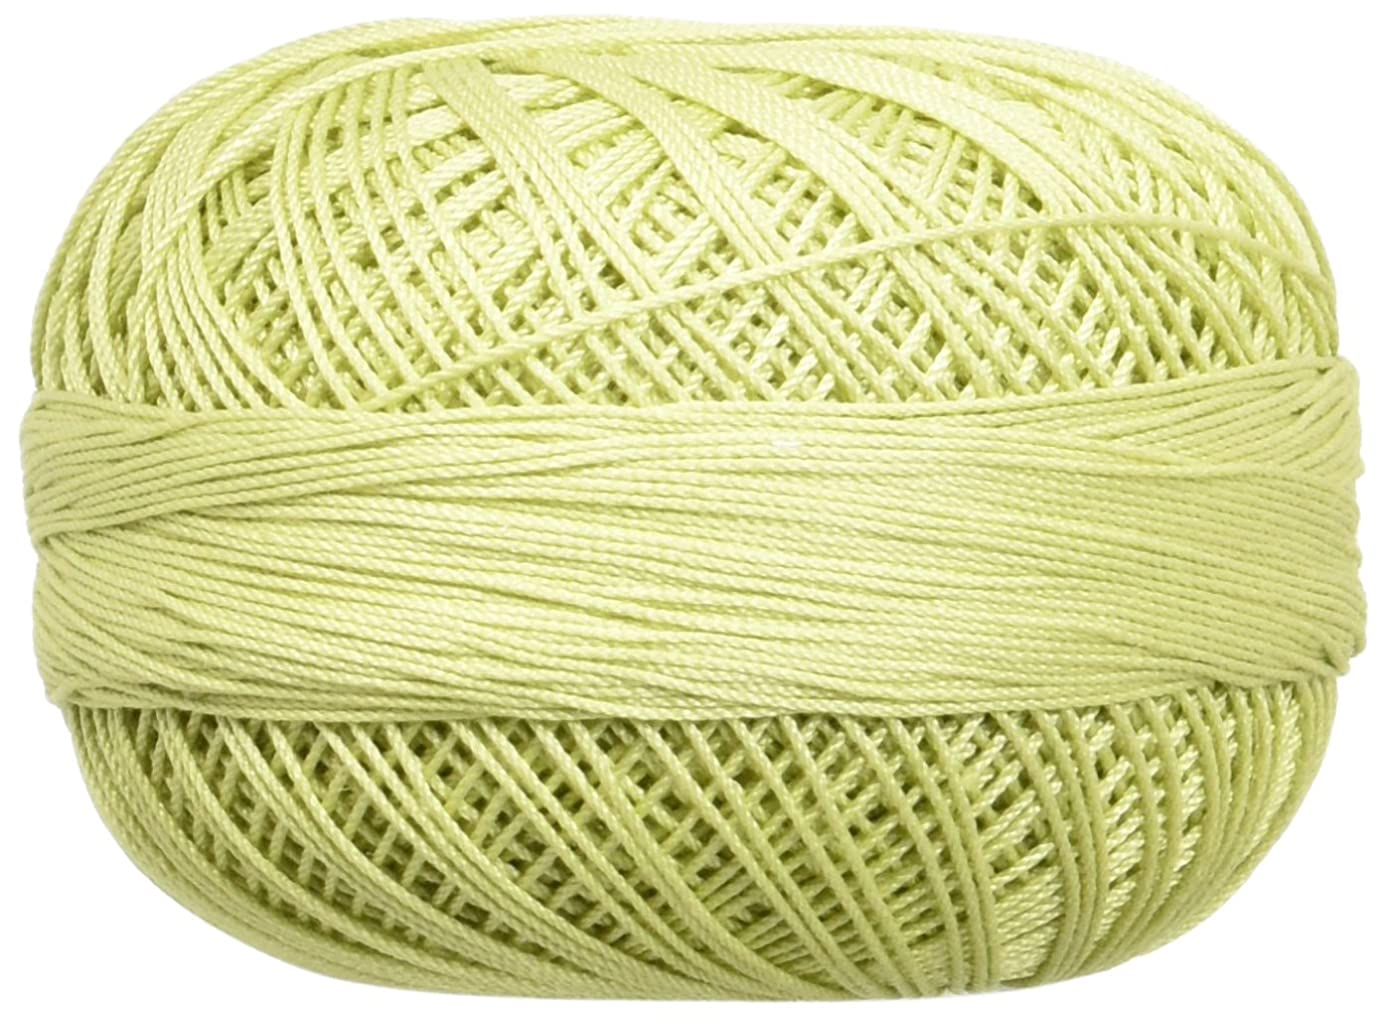 Handy Hands 210-Yard Lizbeth Cotton Thread, 25gm, Light Leaf Green rojlkj8908